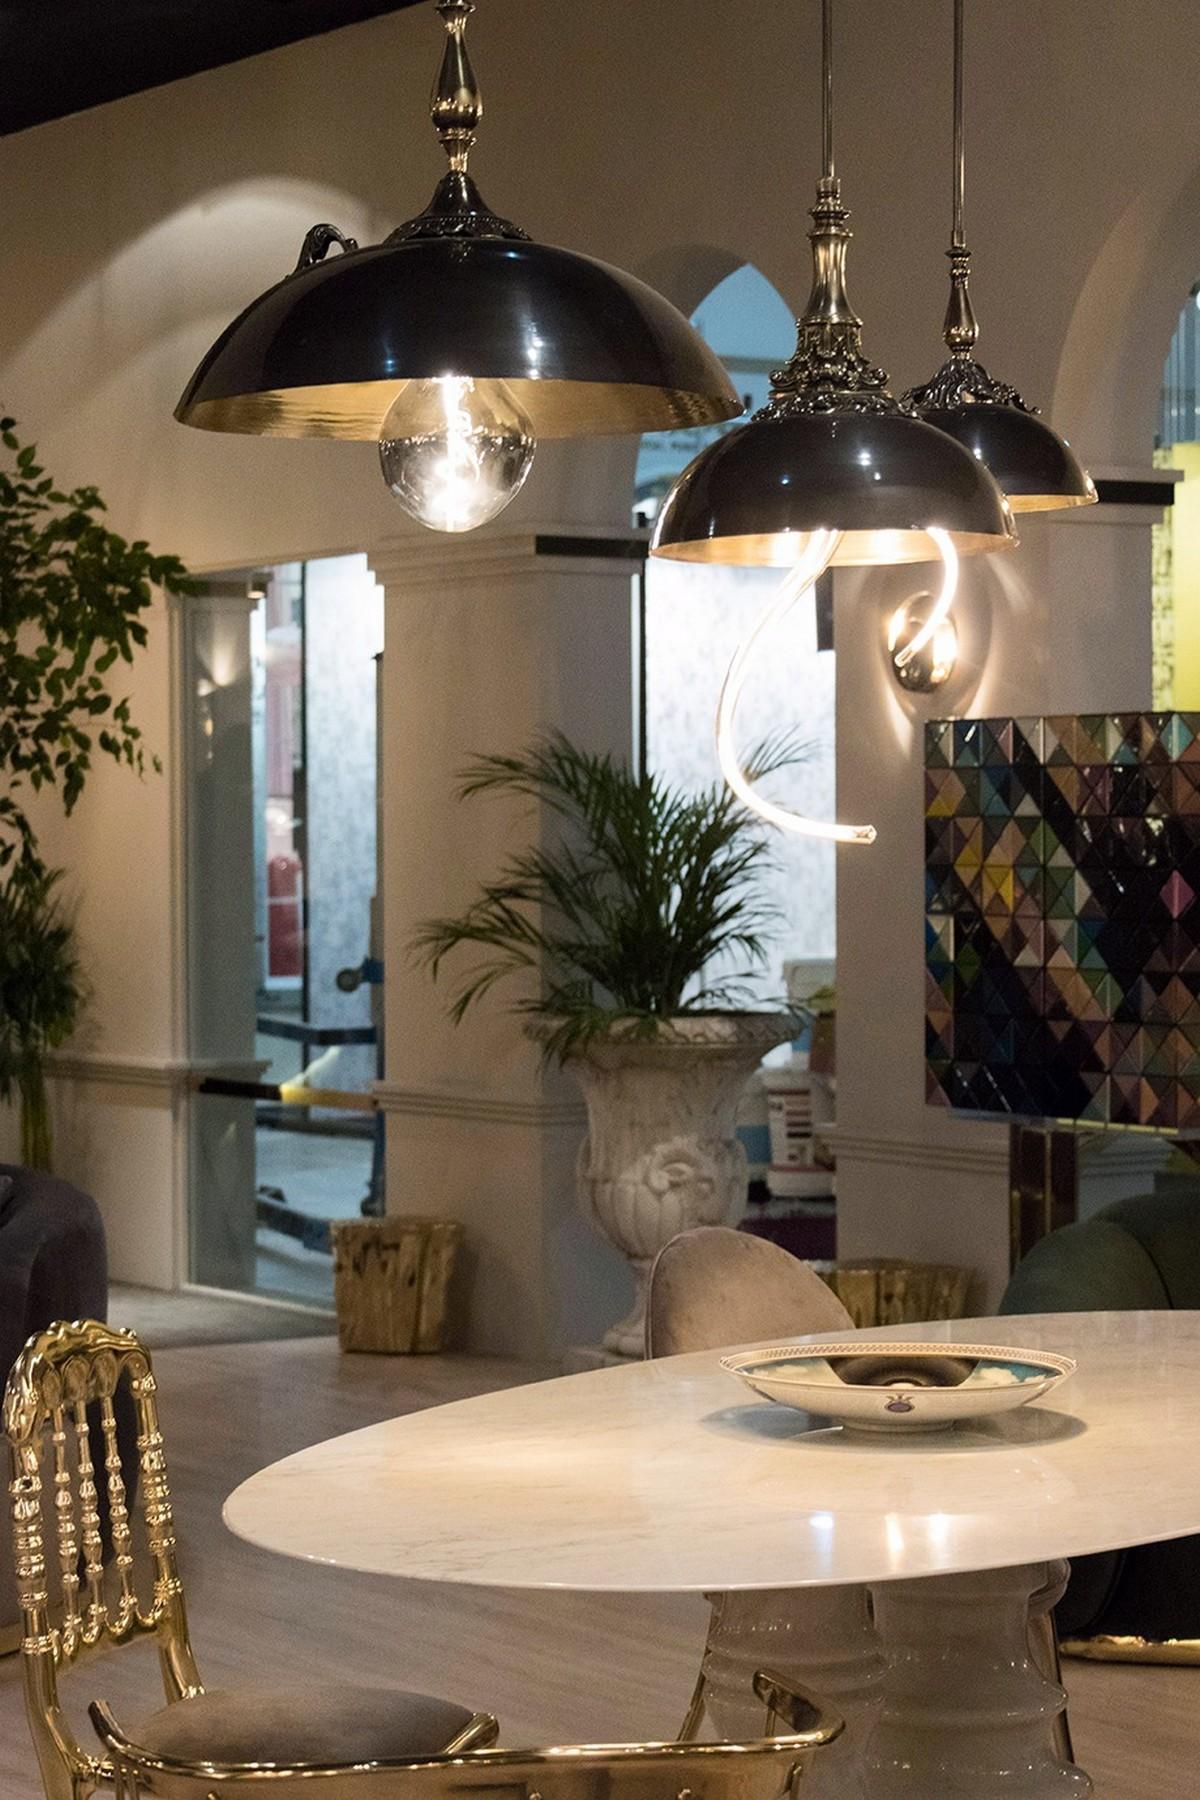 dining room designs New Dining Room Designs (Part II) triptico